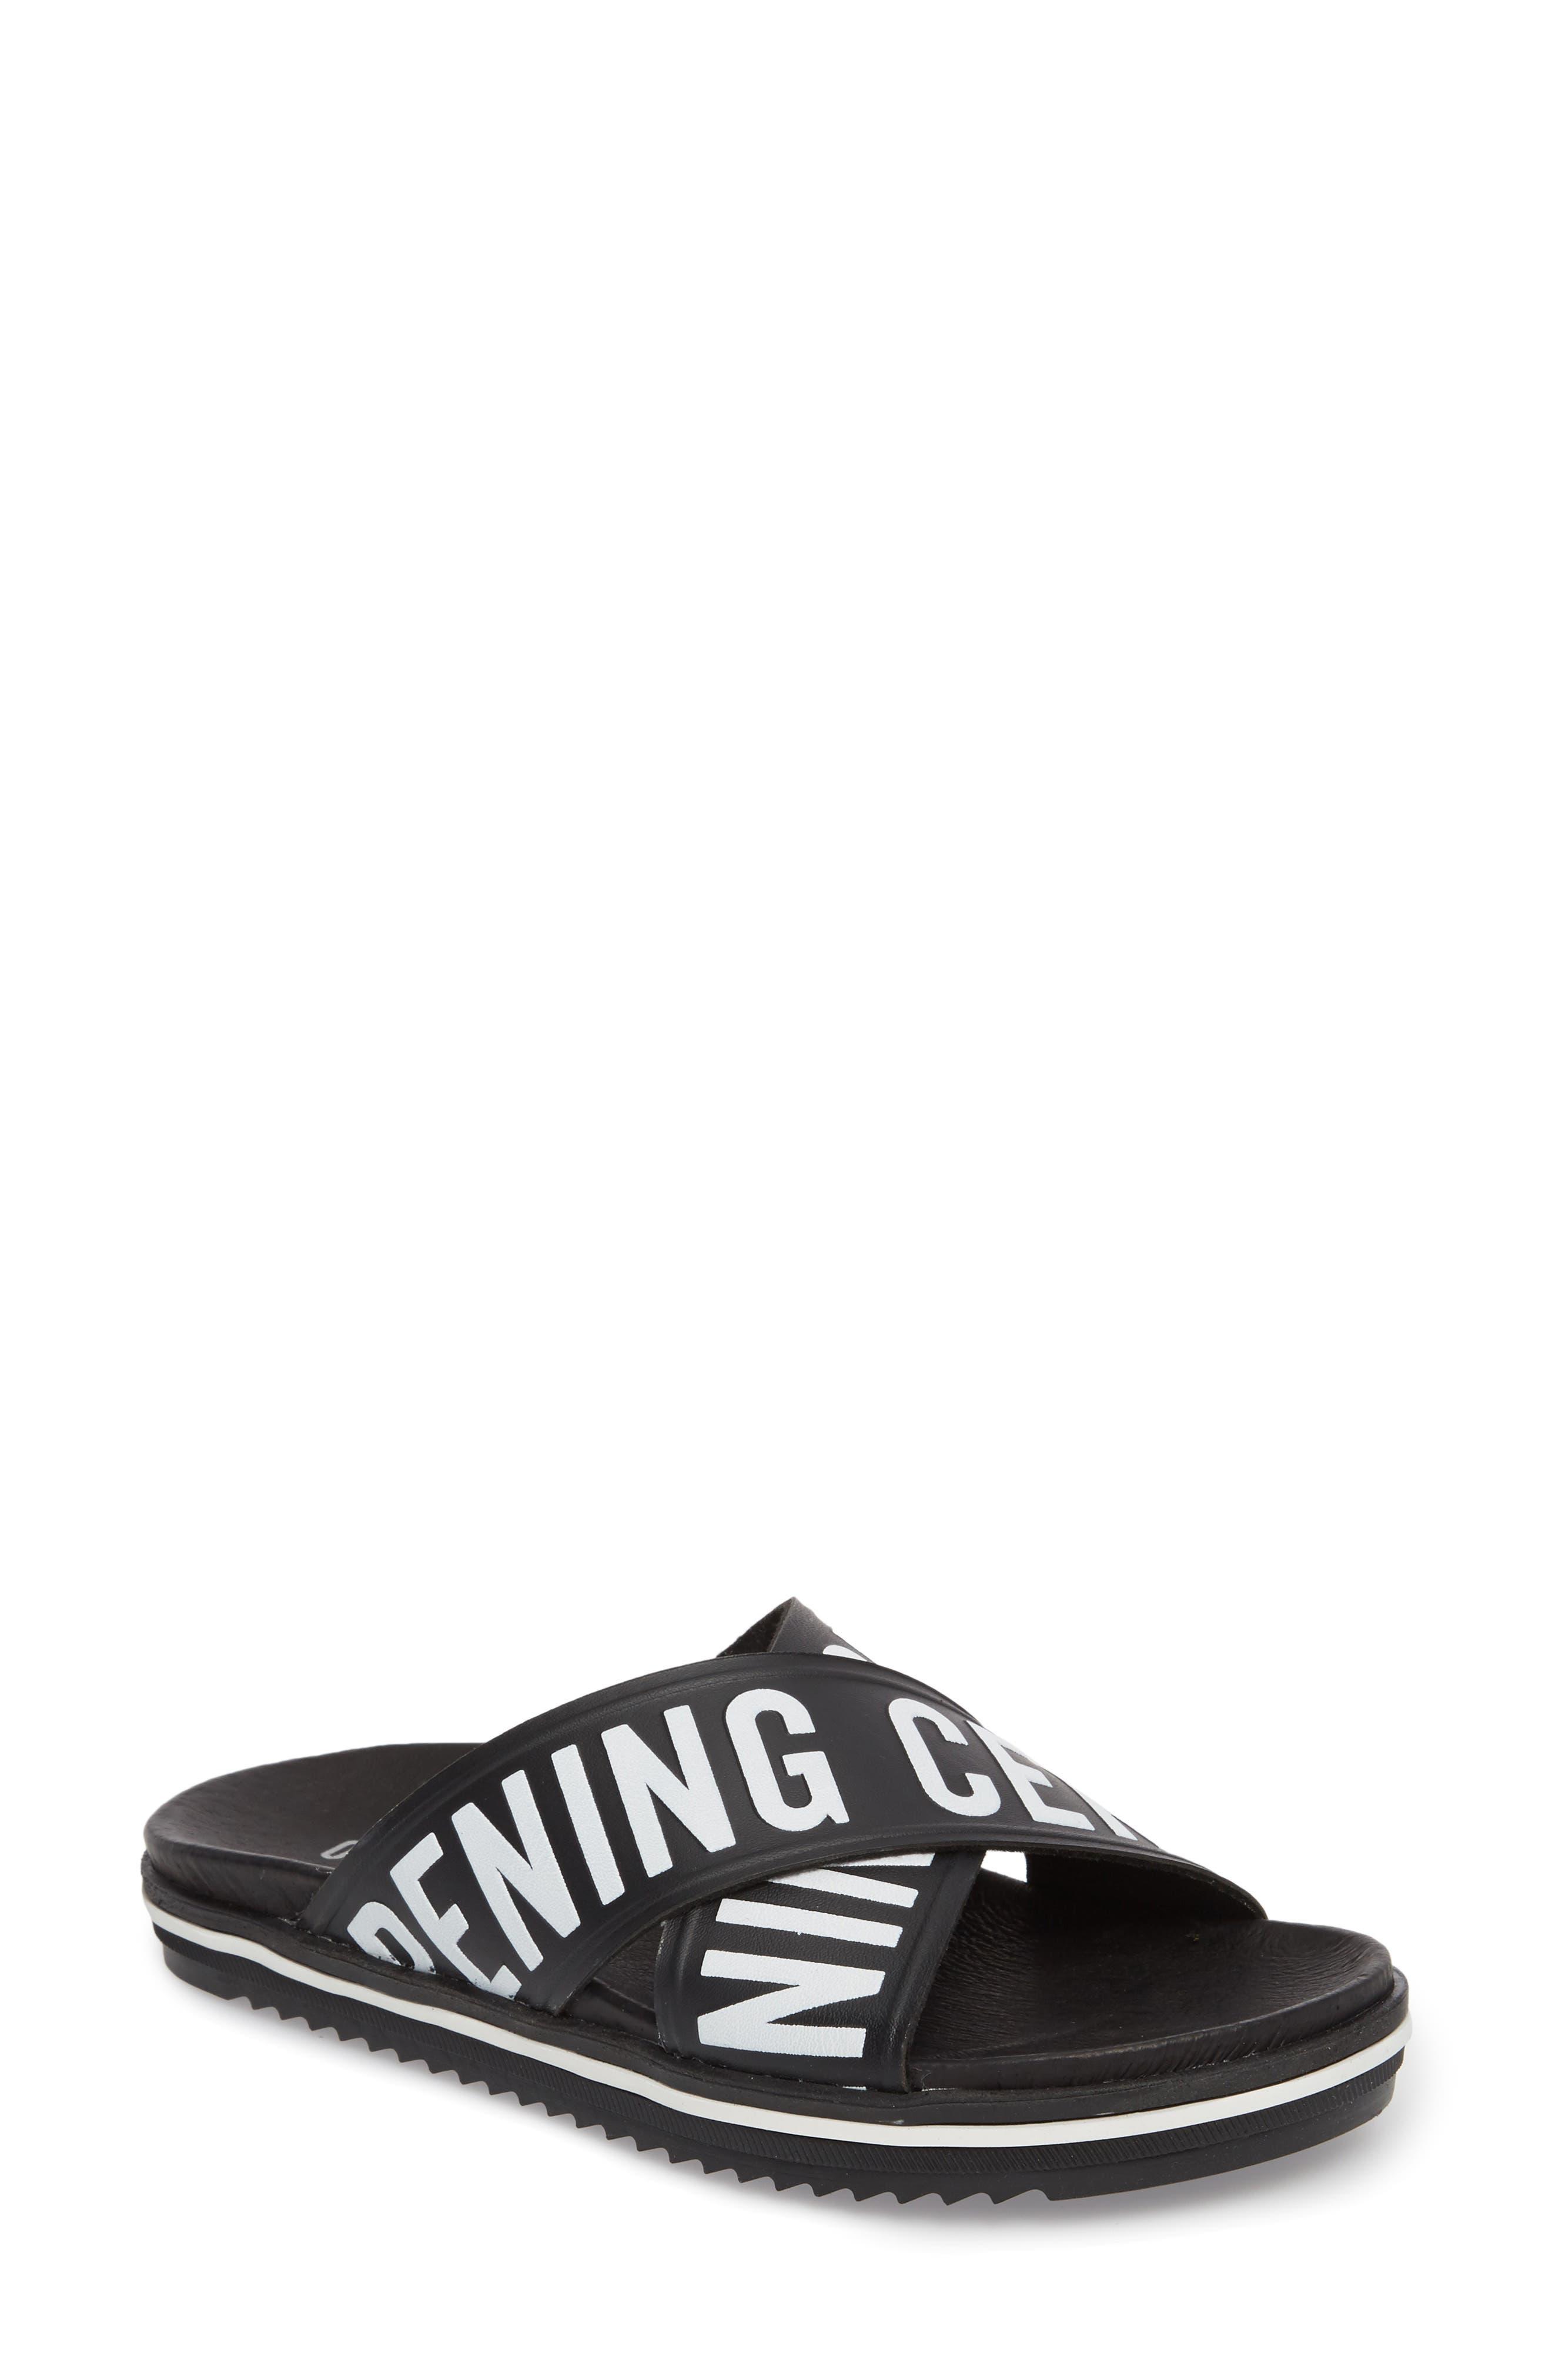 Berkeley Slide Sandal,                             Main thumbnail 1, color,                             BLACK MULTI